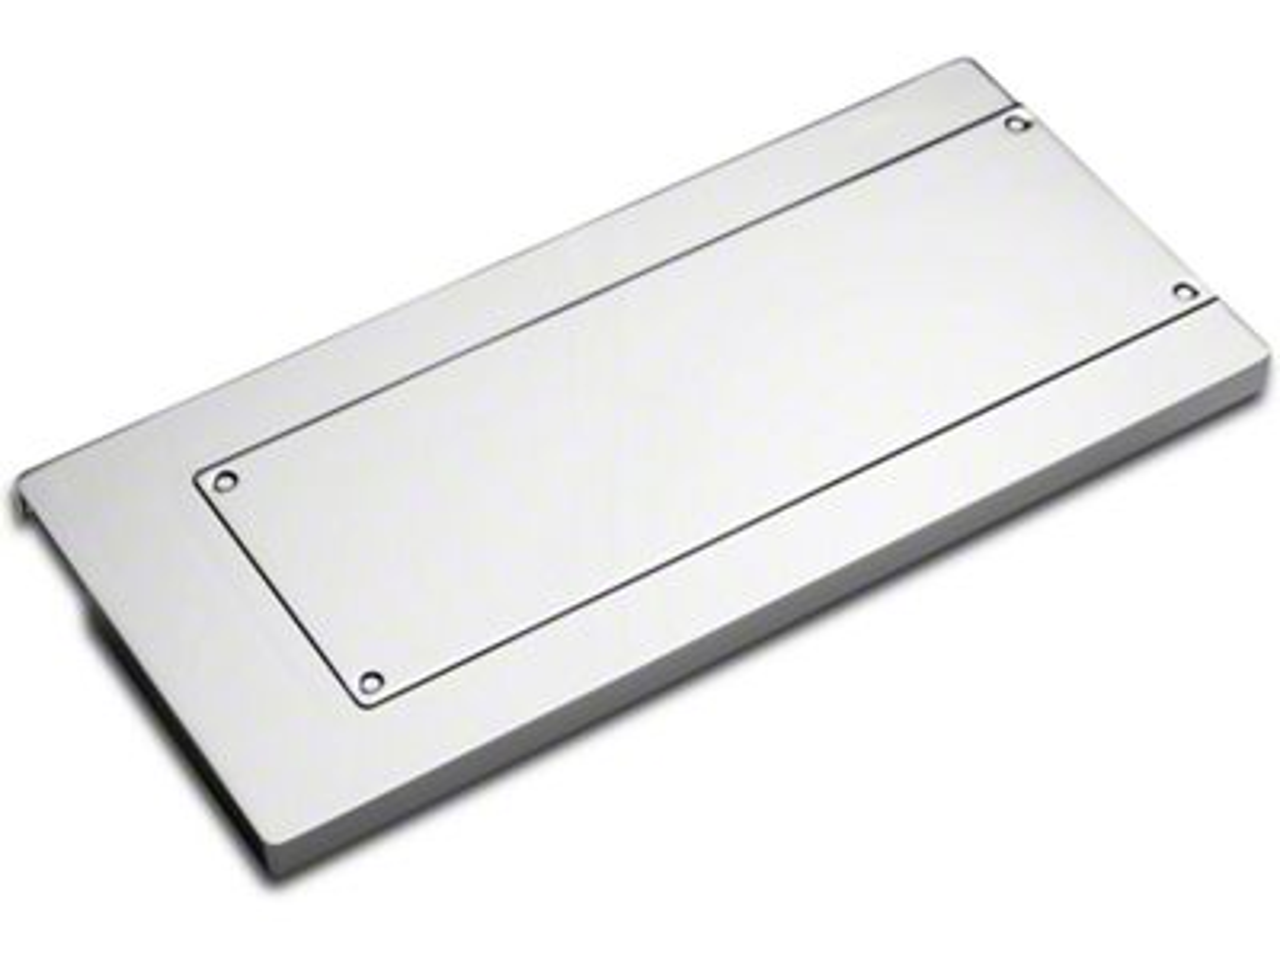 Modern Billet Chrome Fuse Box Cover (05-09 All)